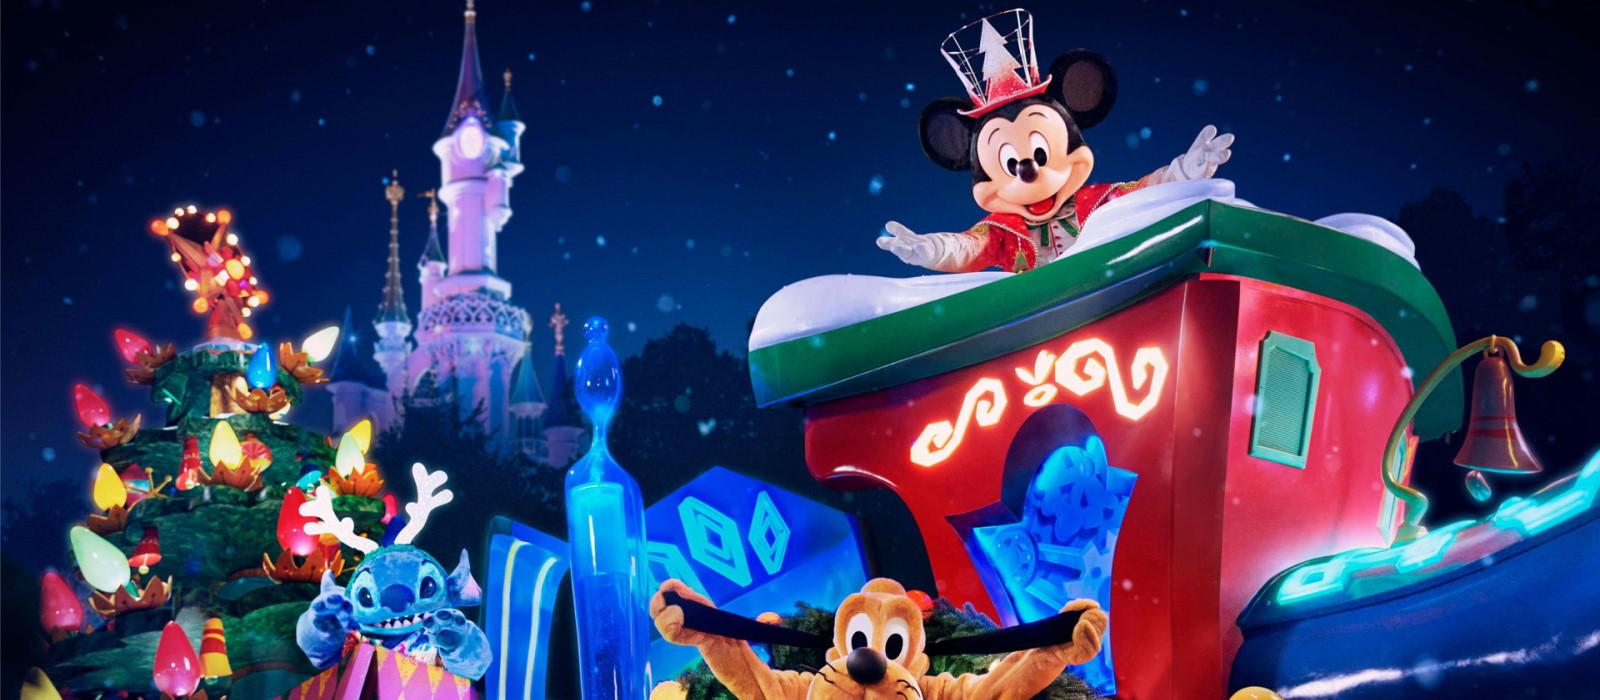 Nieuwe kerstparade <br> in Disneyland Paris